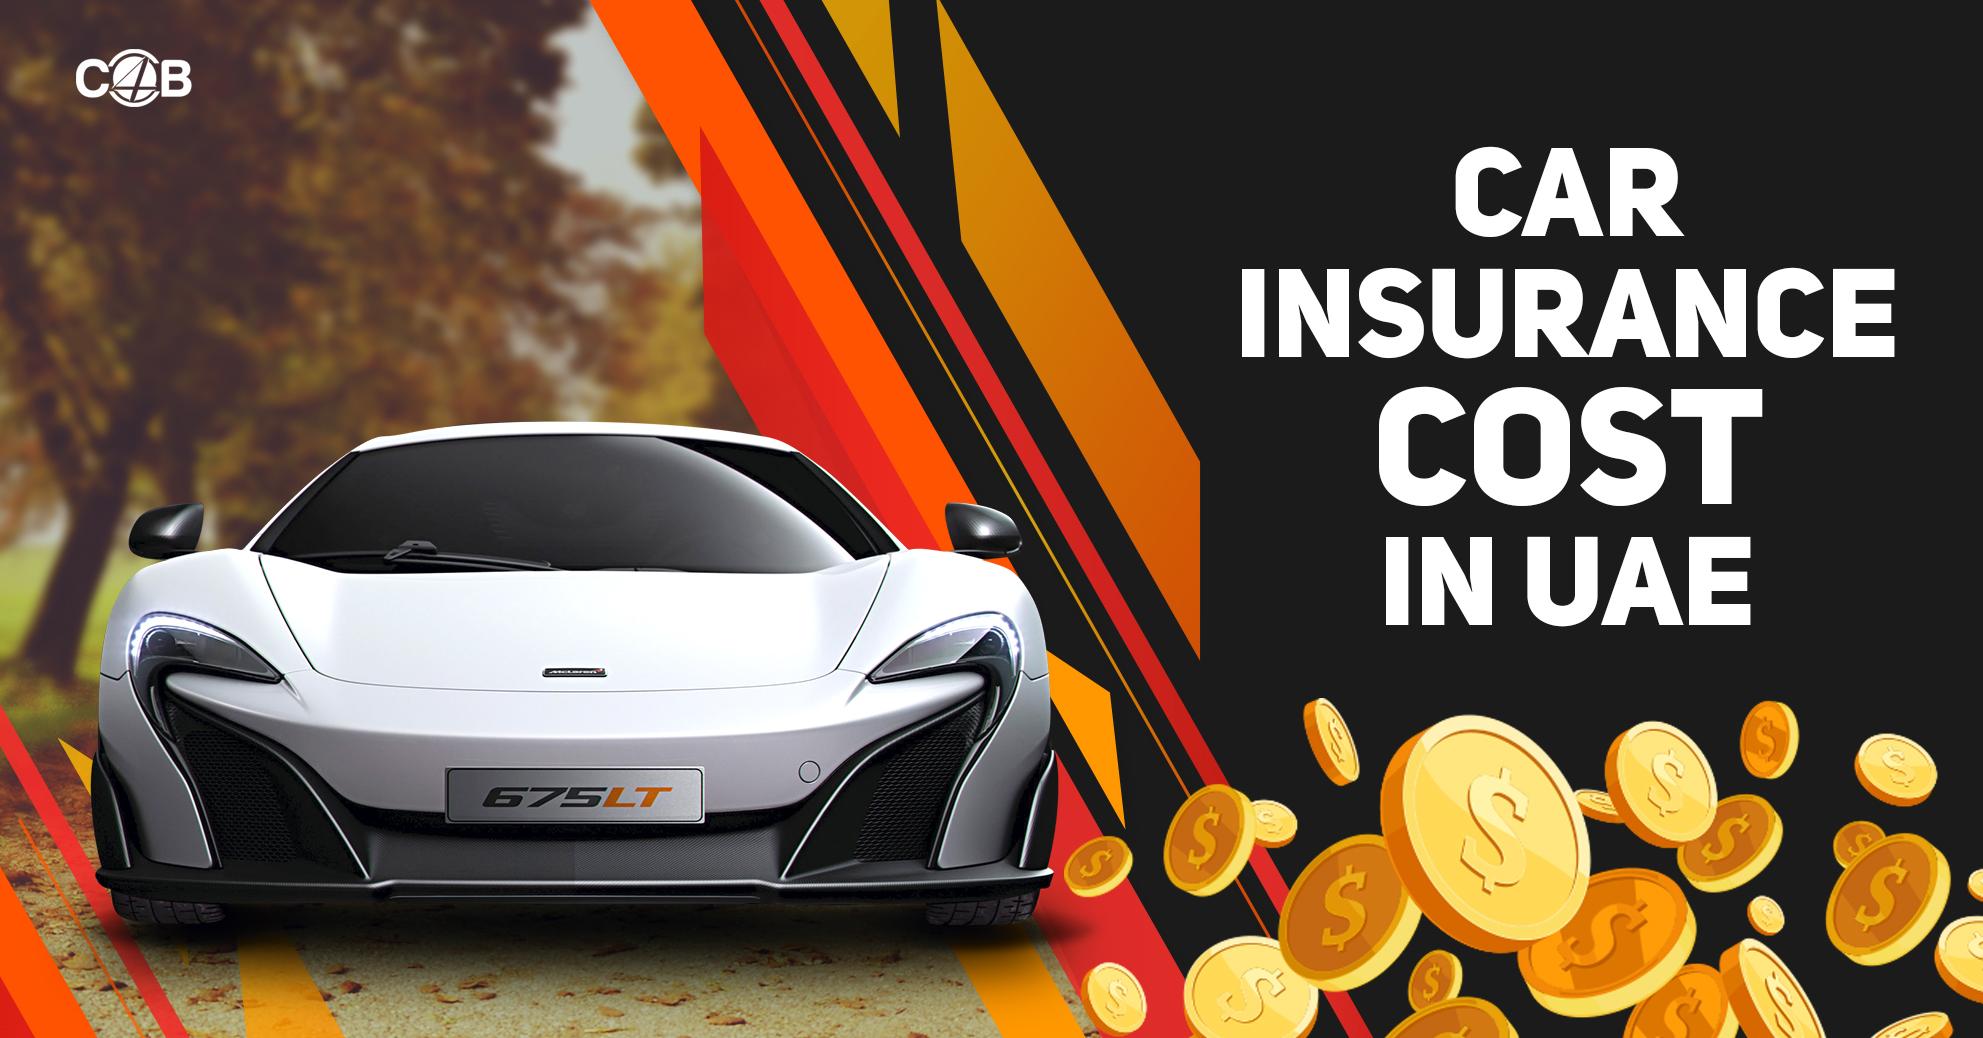 Car Insurance Cost in UAE - Money Clinic